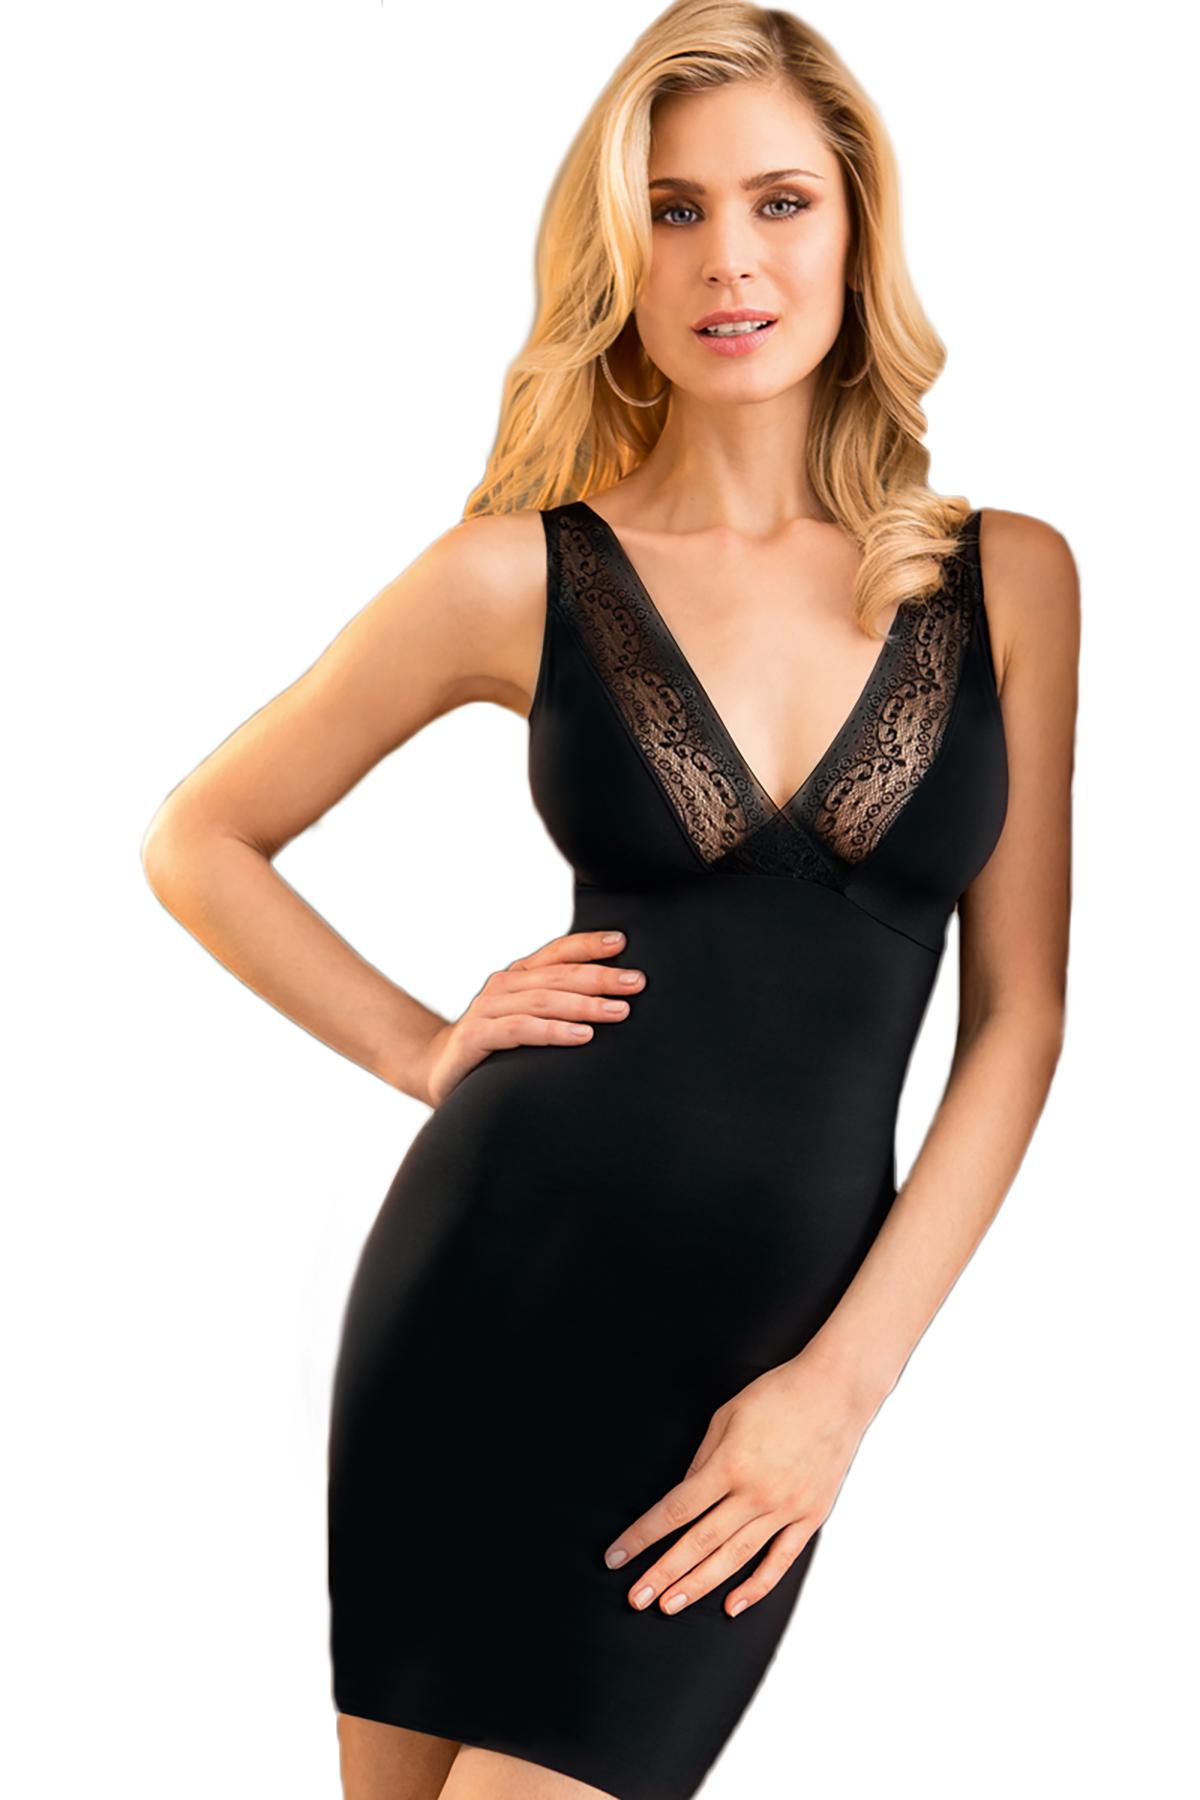 susa body forming fond de robe sculptant femme 5536 s xl 2. Black Bedroom Furniture Sets. Home Design Ideas